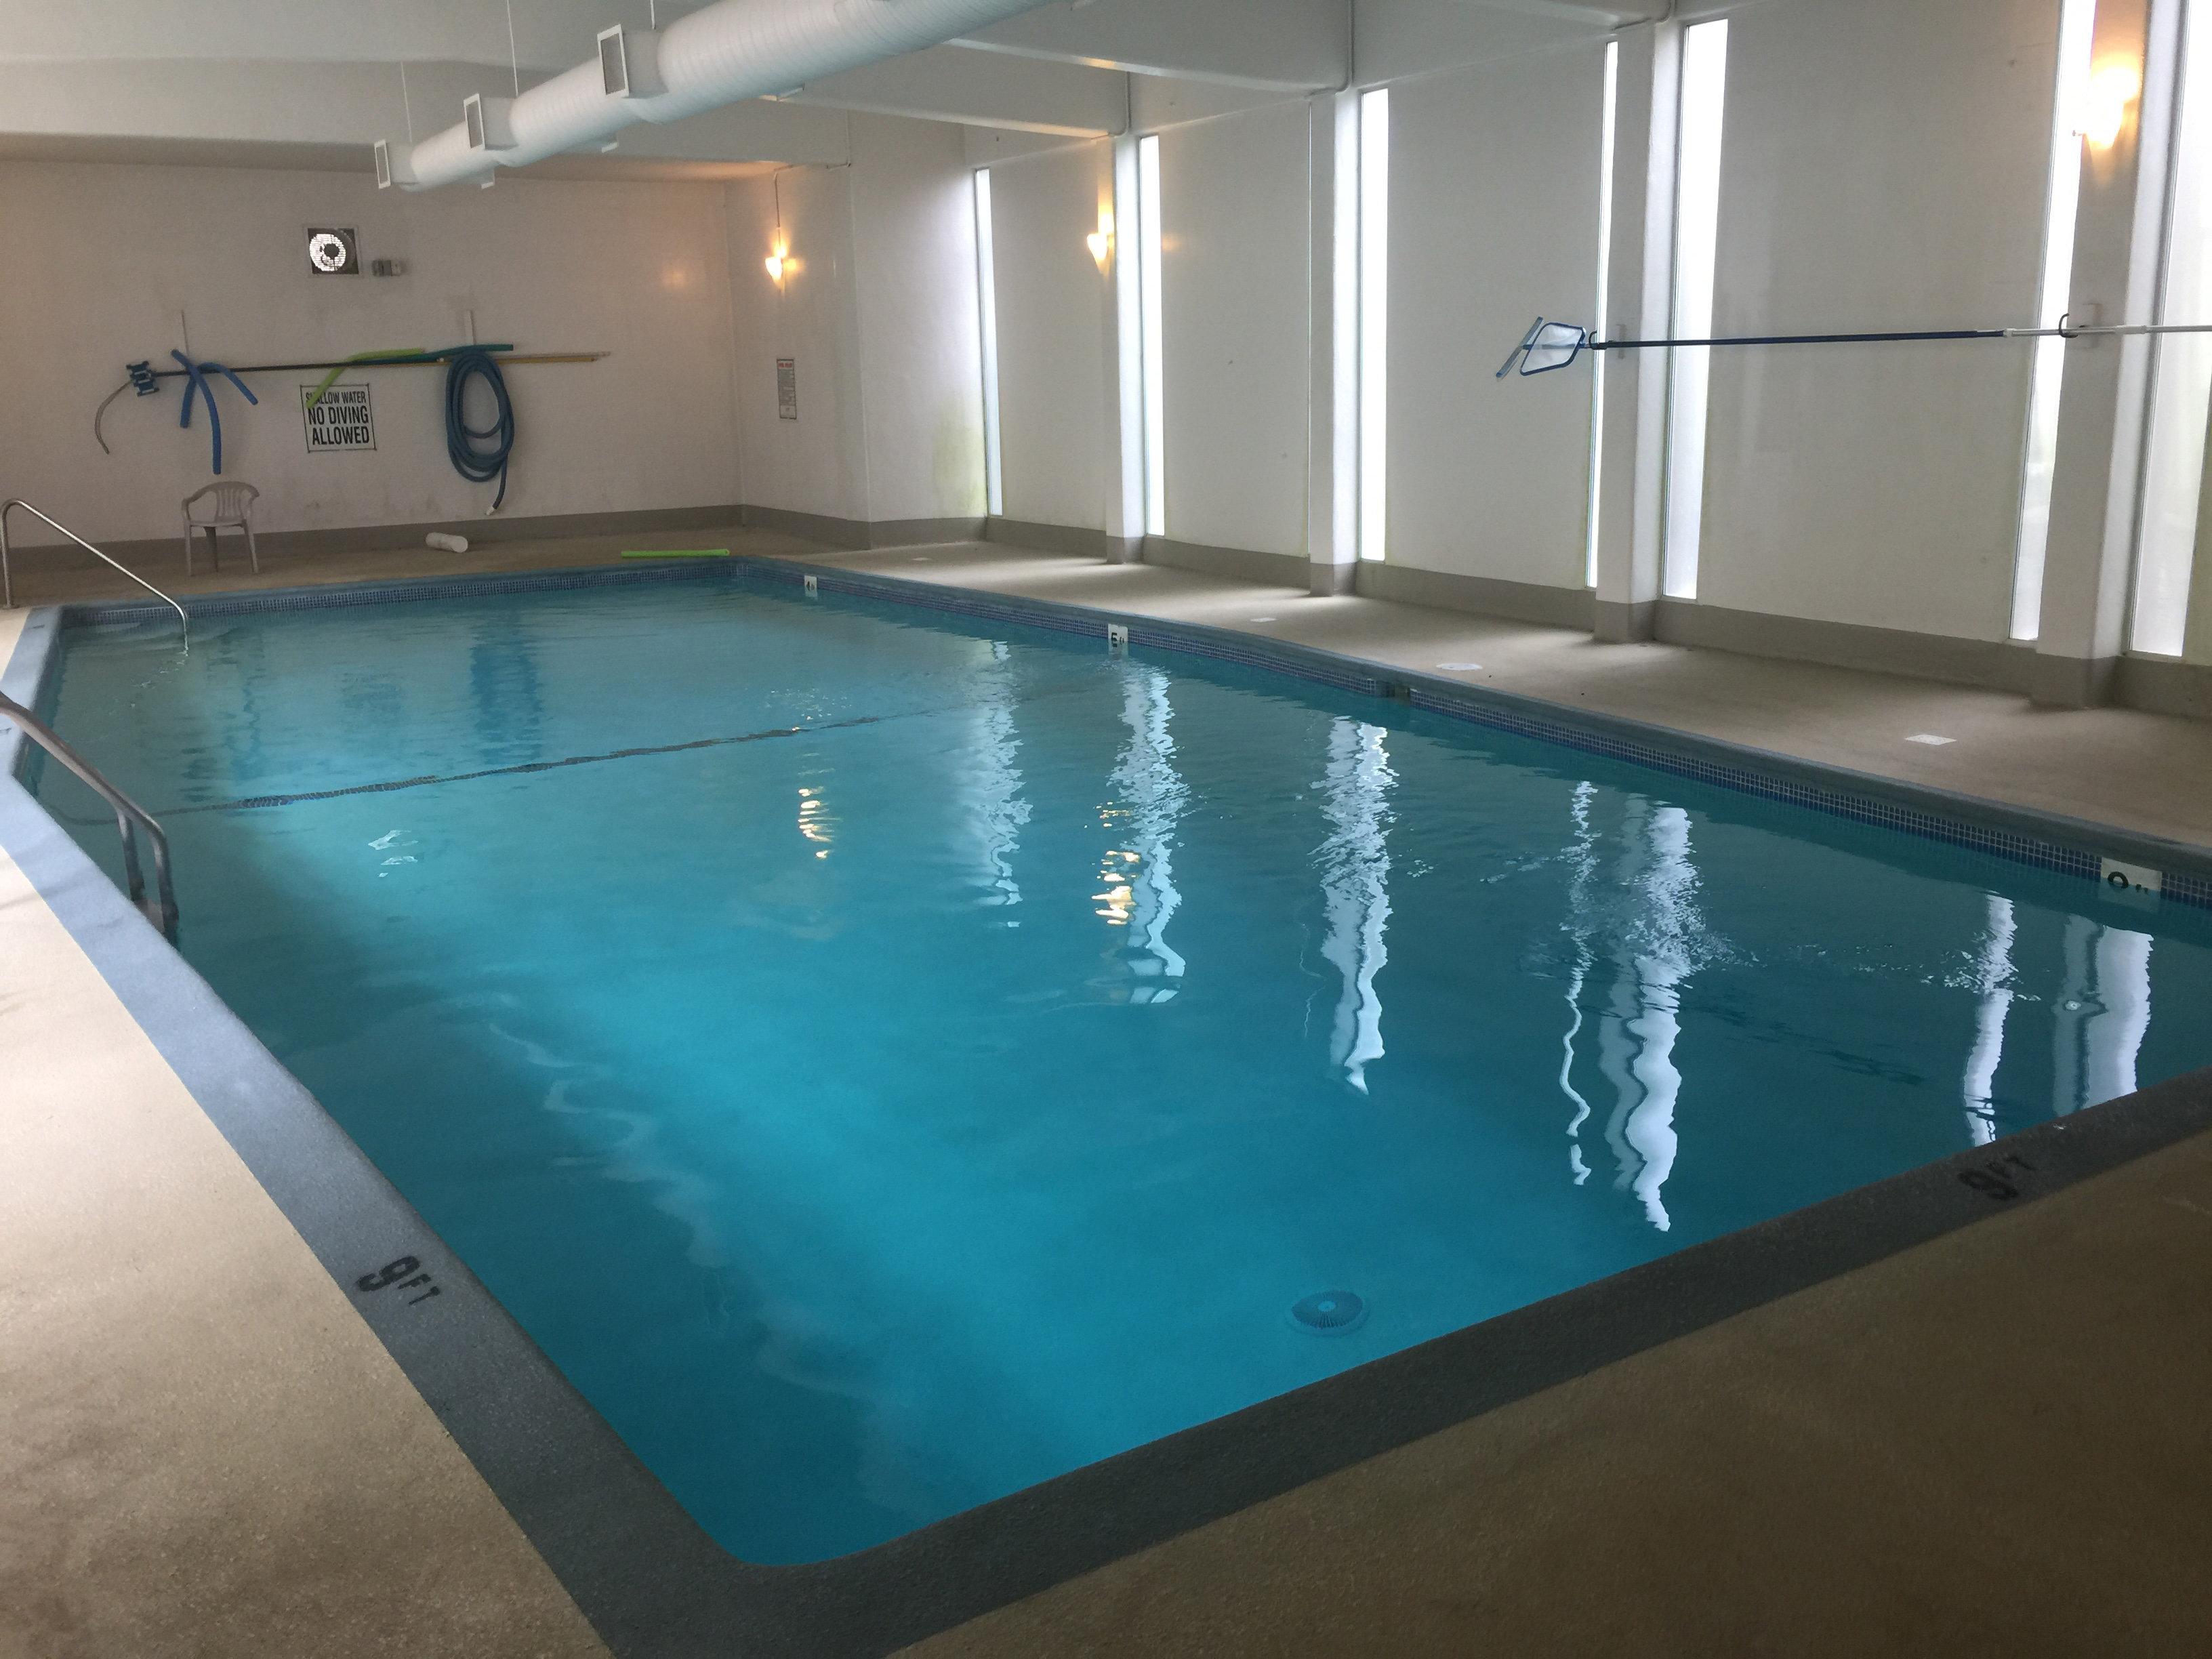 1850 Comox Swimming Pool!